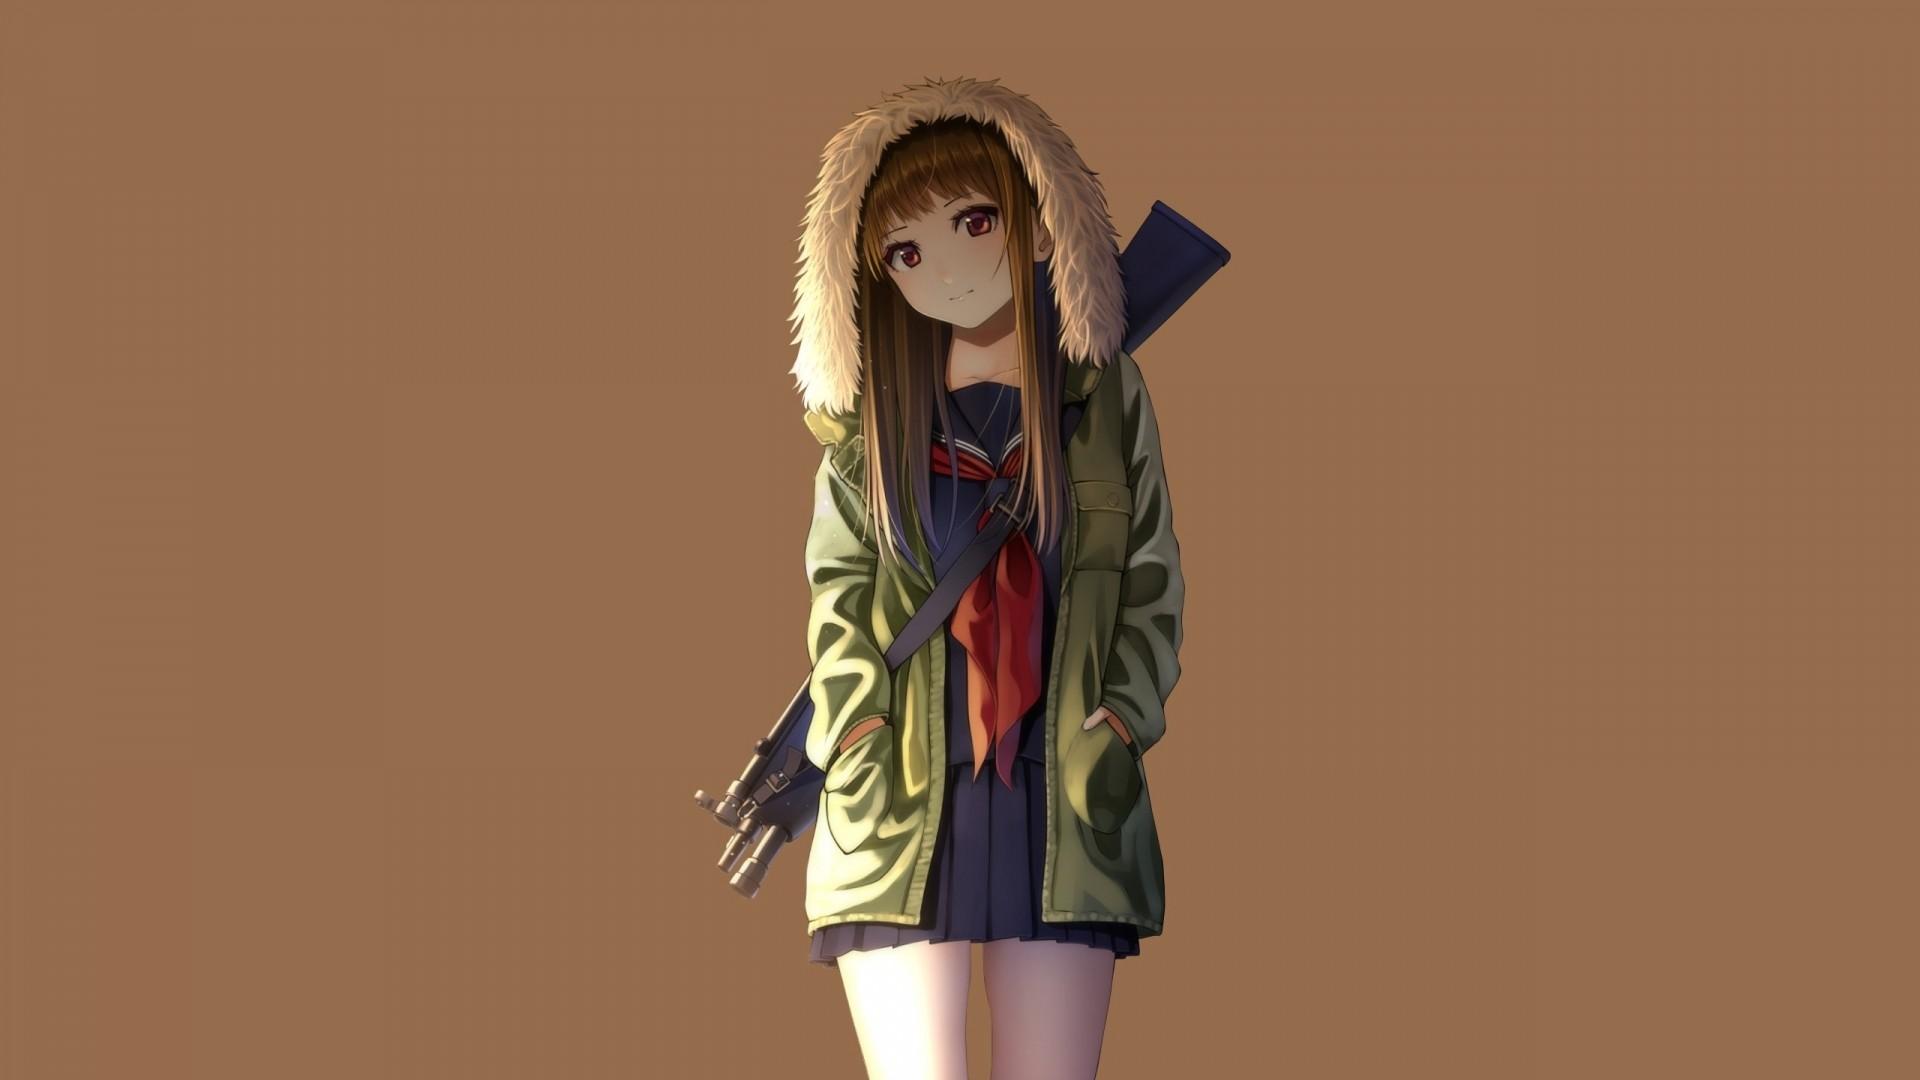 Hoodie Cute Anime Girl Image